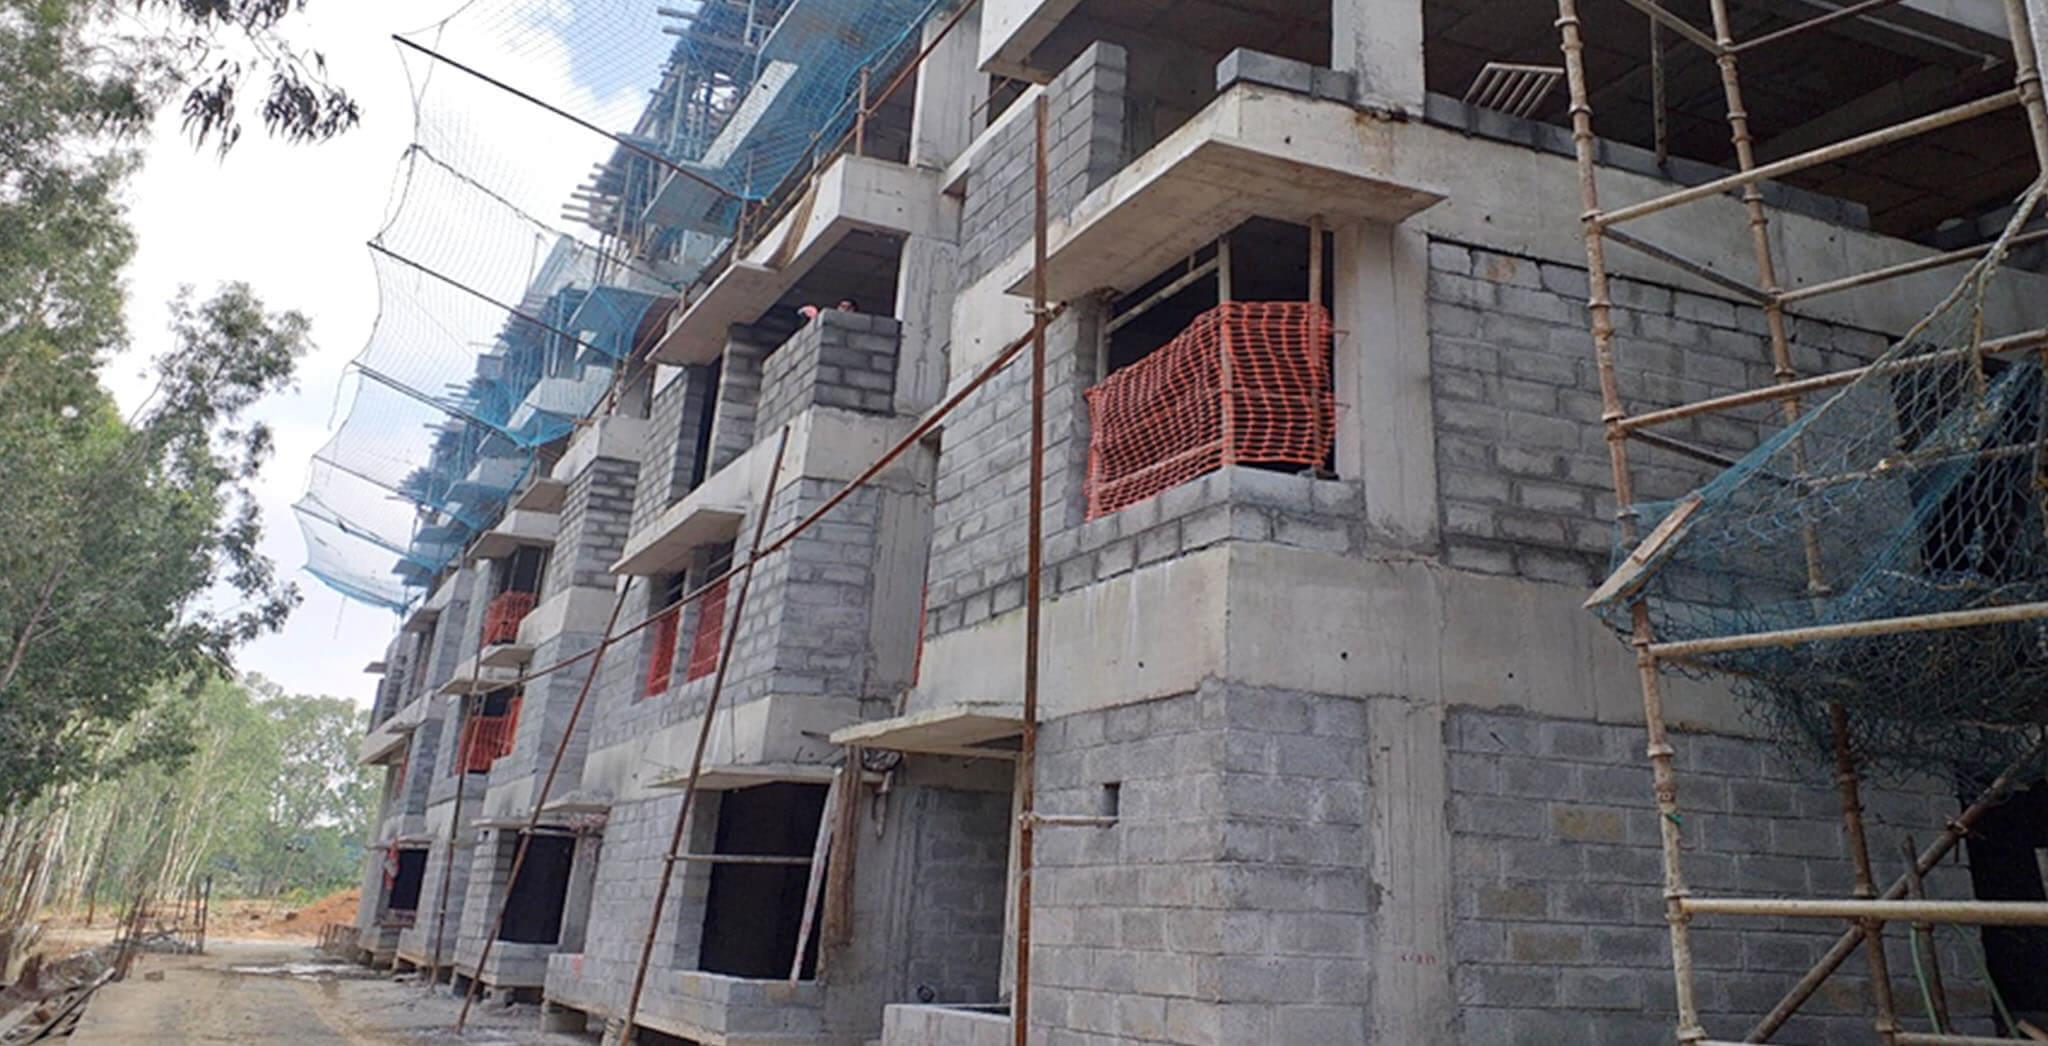 Jan 2020 - L & M Blocks: Ground & First Floor block work completed, Second floor block work-in-progress